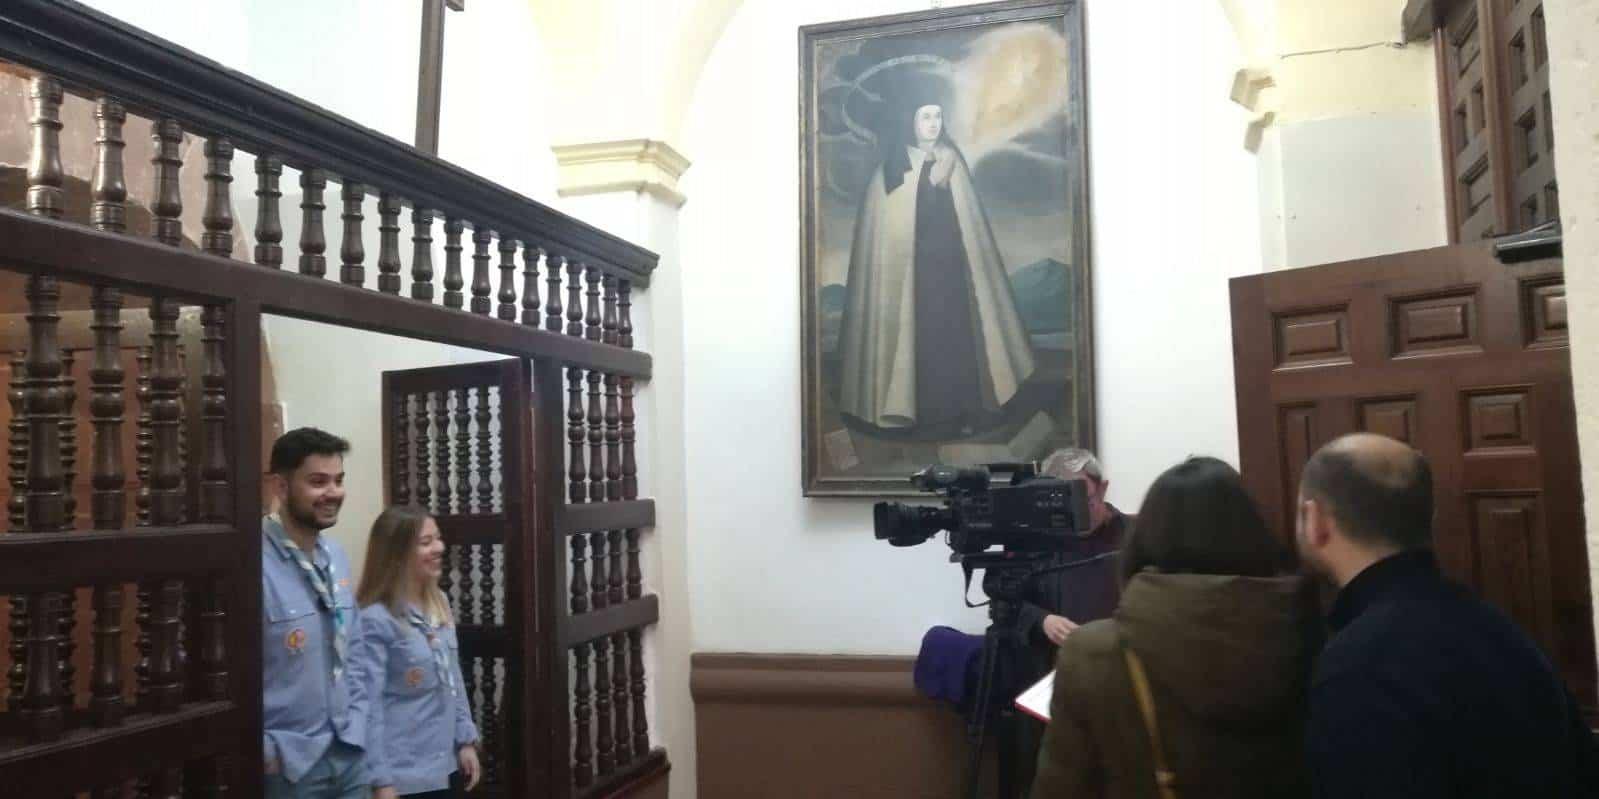 Mancha Centro Television en la parroquia de Herencia 1 - Mancha Centro Televisión emite un especial sobre la parroquia de Herencia